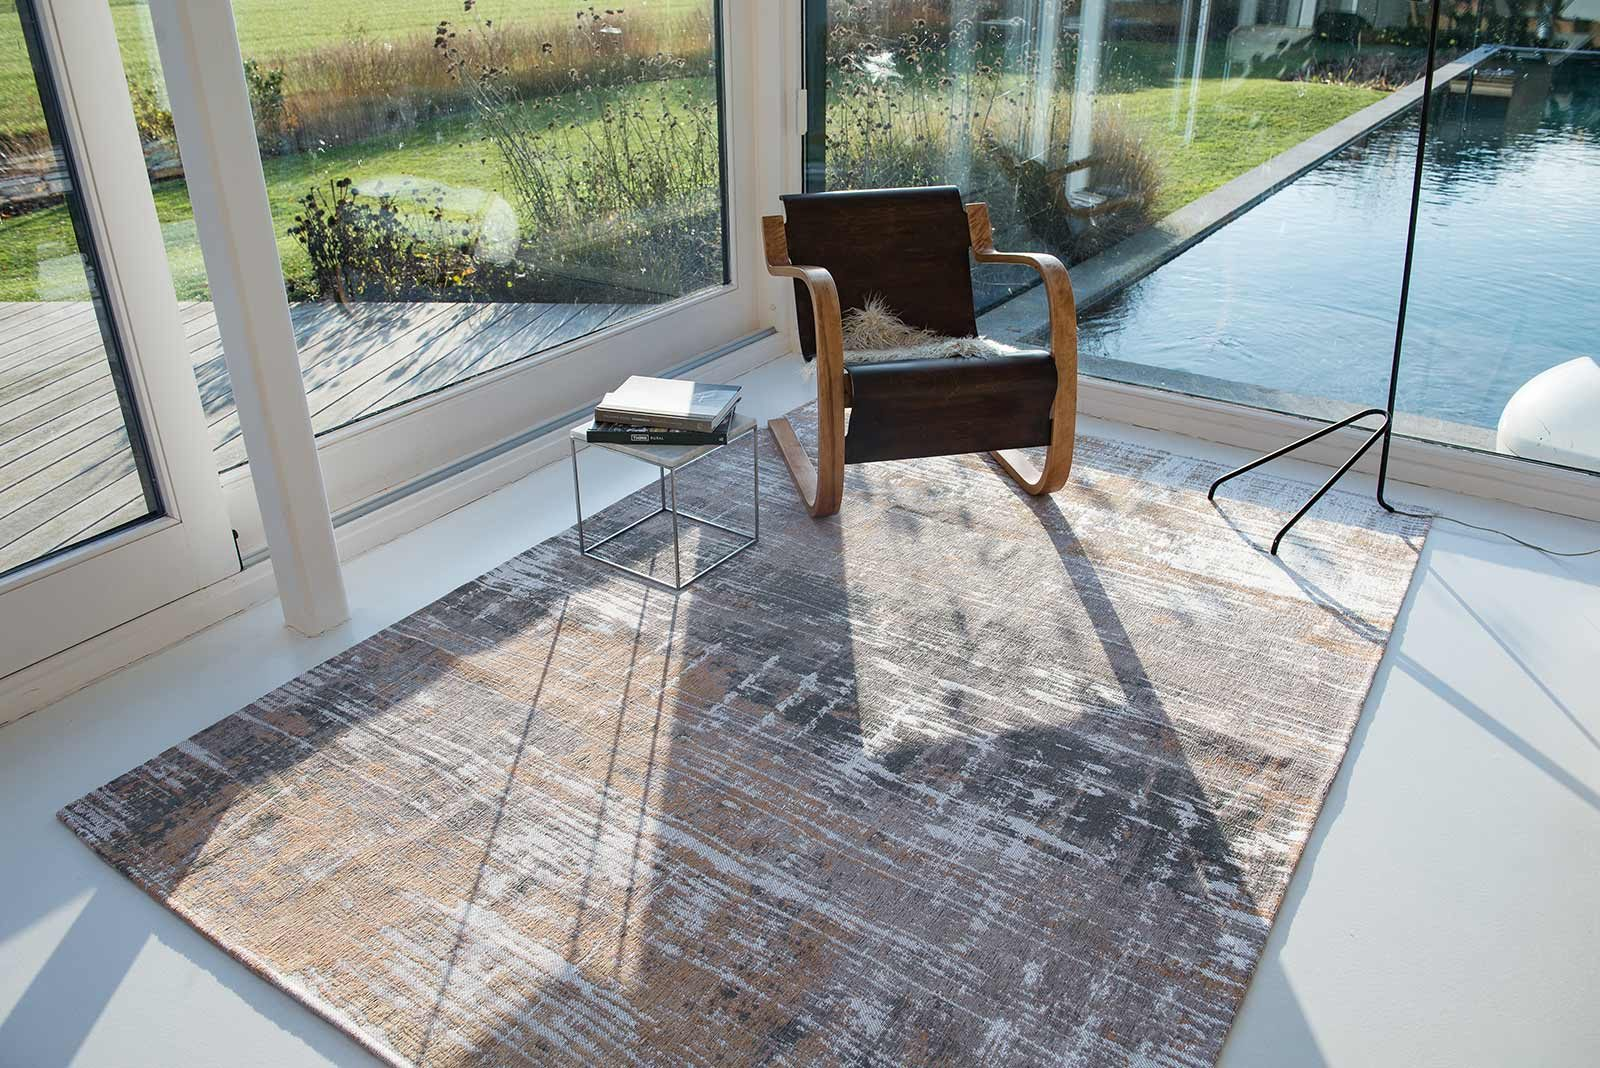 rugs Louis De Poortere LX8717 Atlantic Streaks Parsons Powder interior